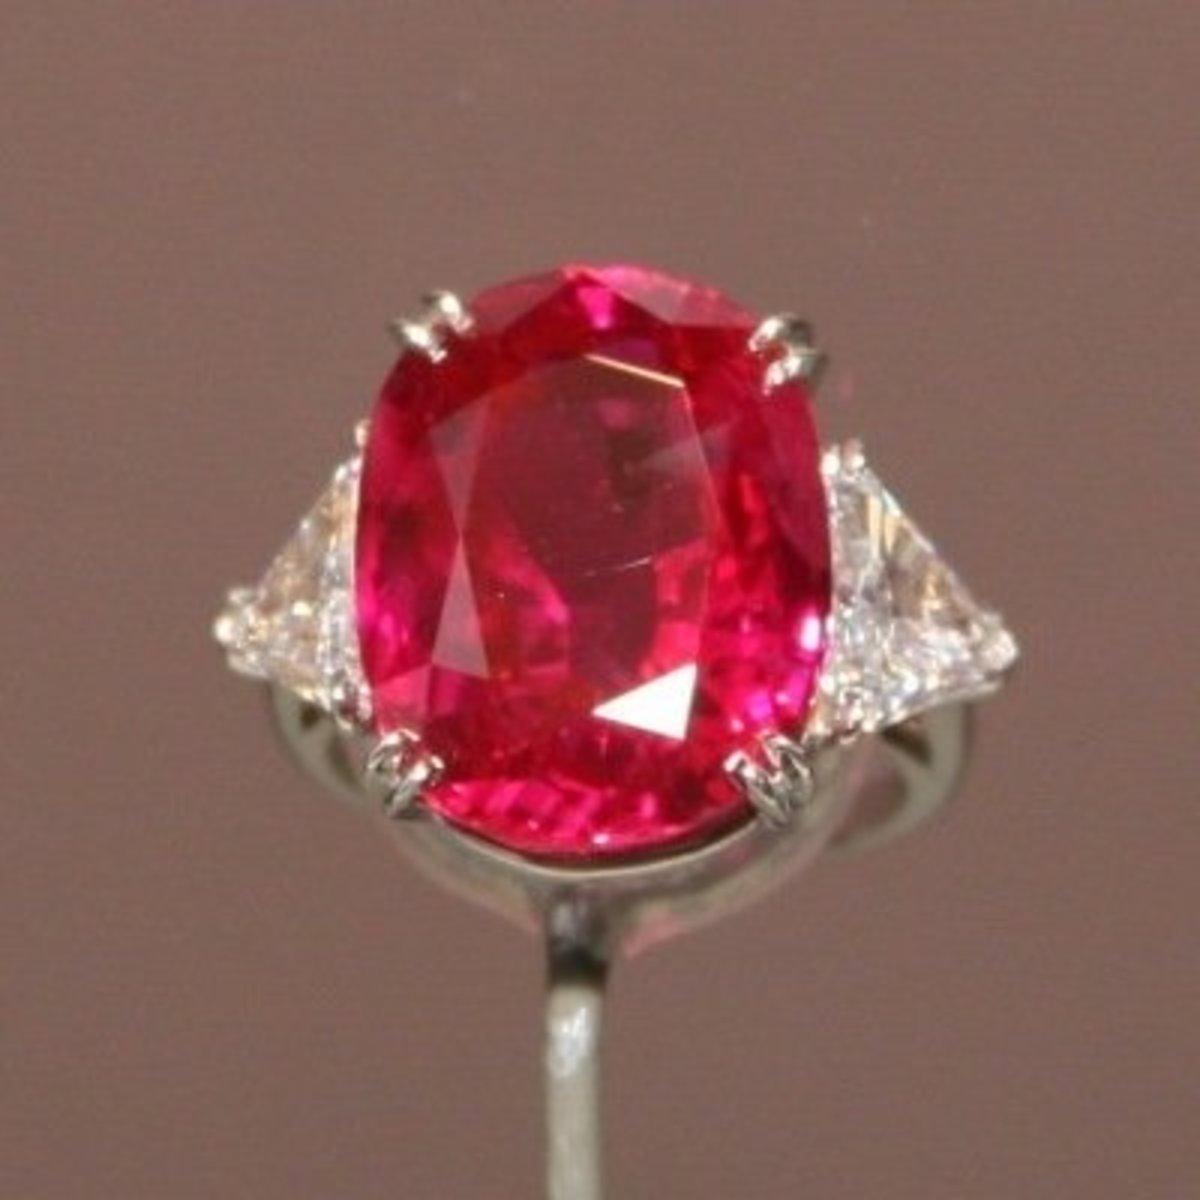 Pink Ruby Gemstones vs Pink Sapphire Gems